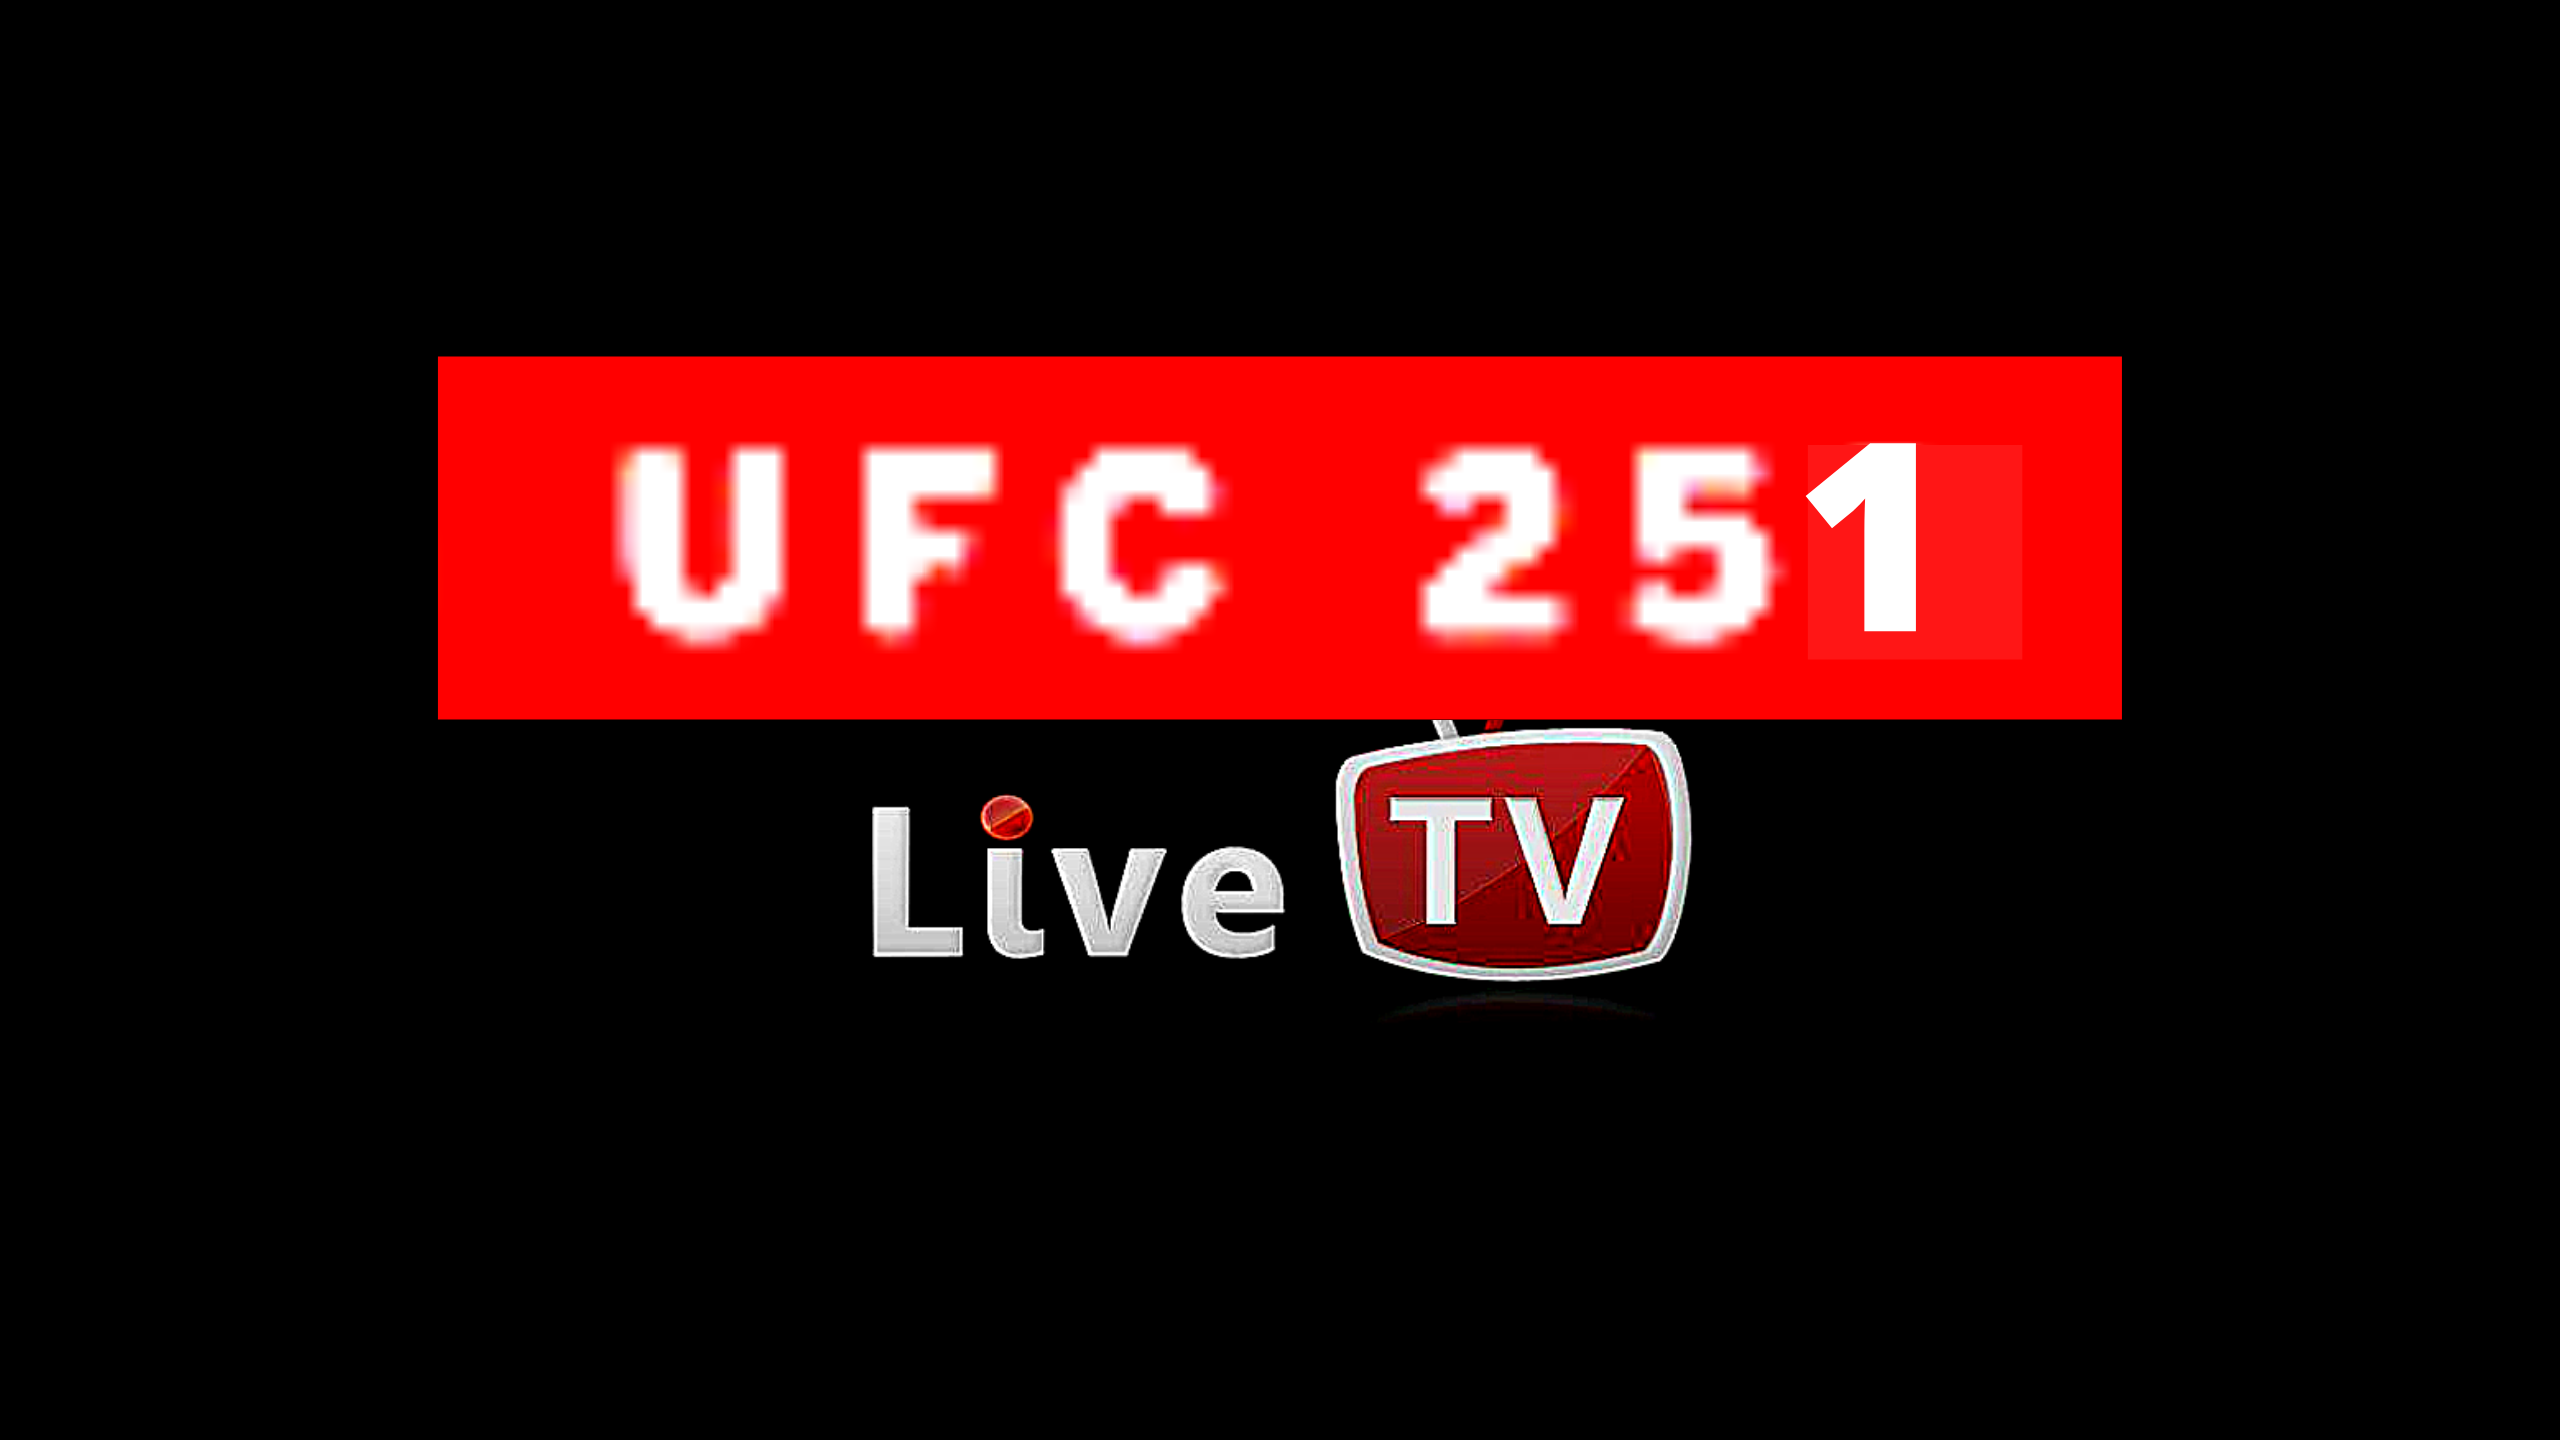 Reddit Free Ufc 251 Masvidal Vs Usman Live Streams 2020 In 2020 Ufc Stream Ufc Streaming